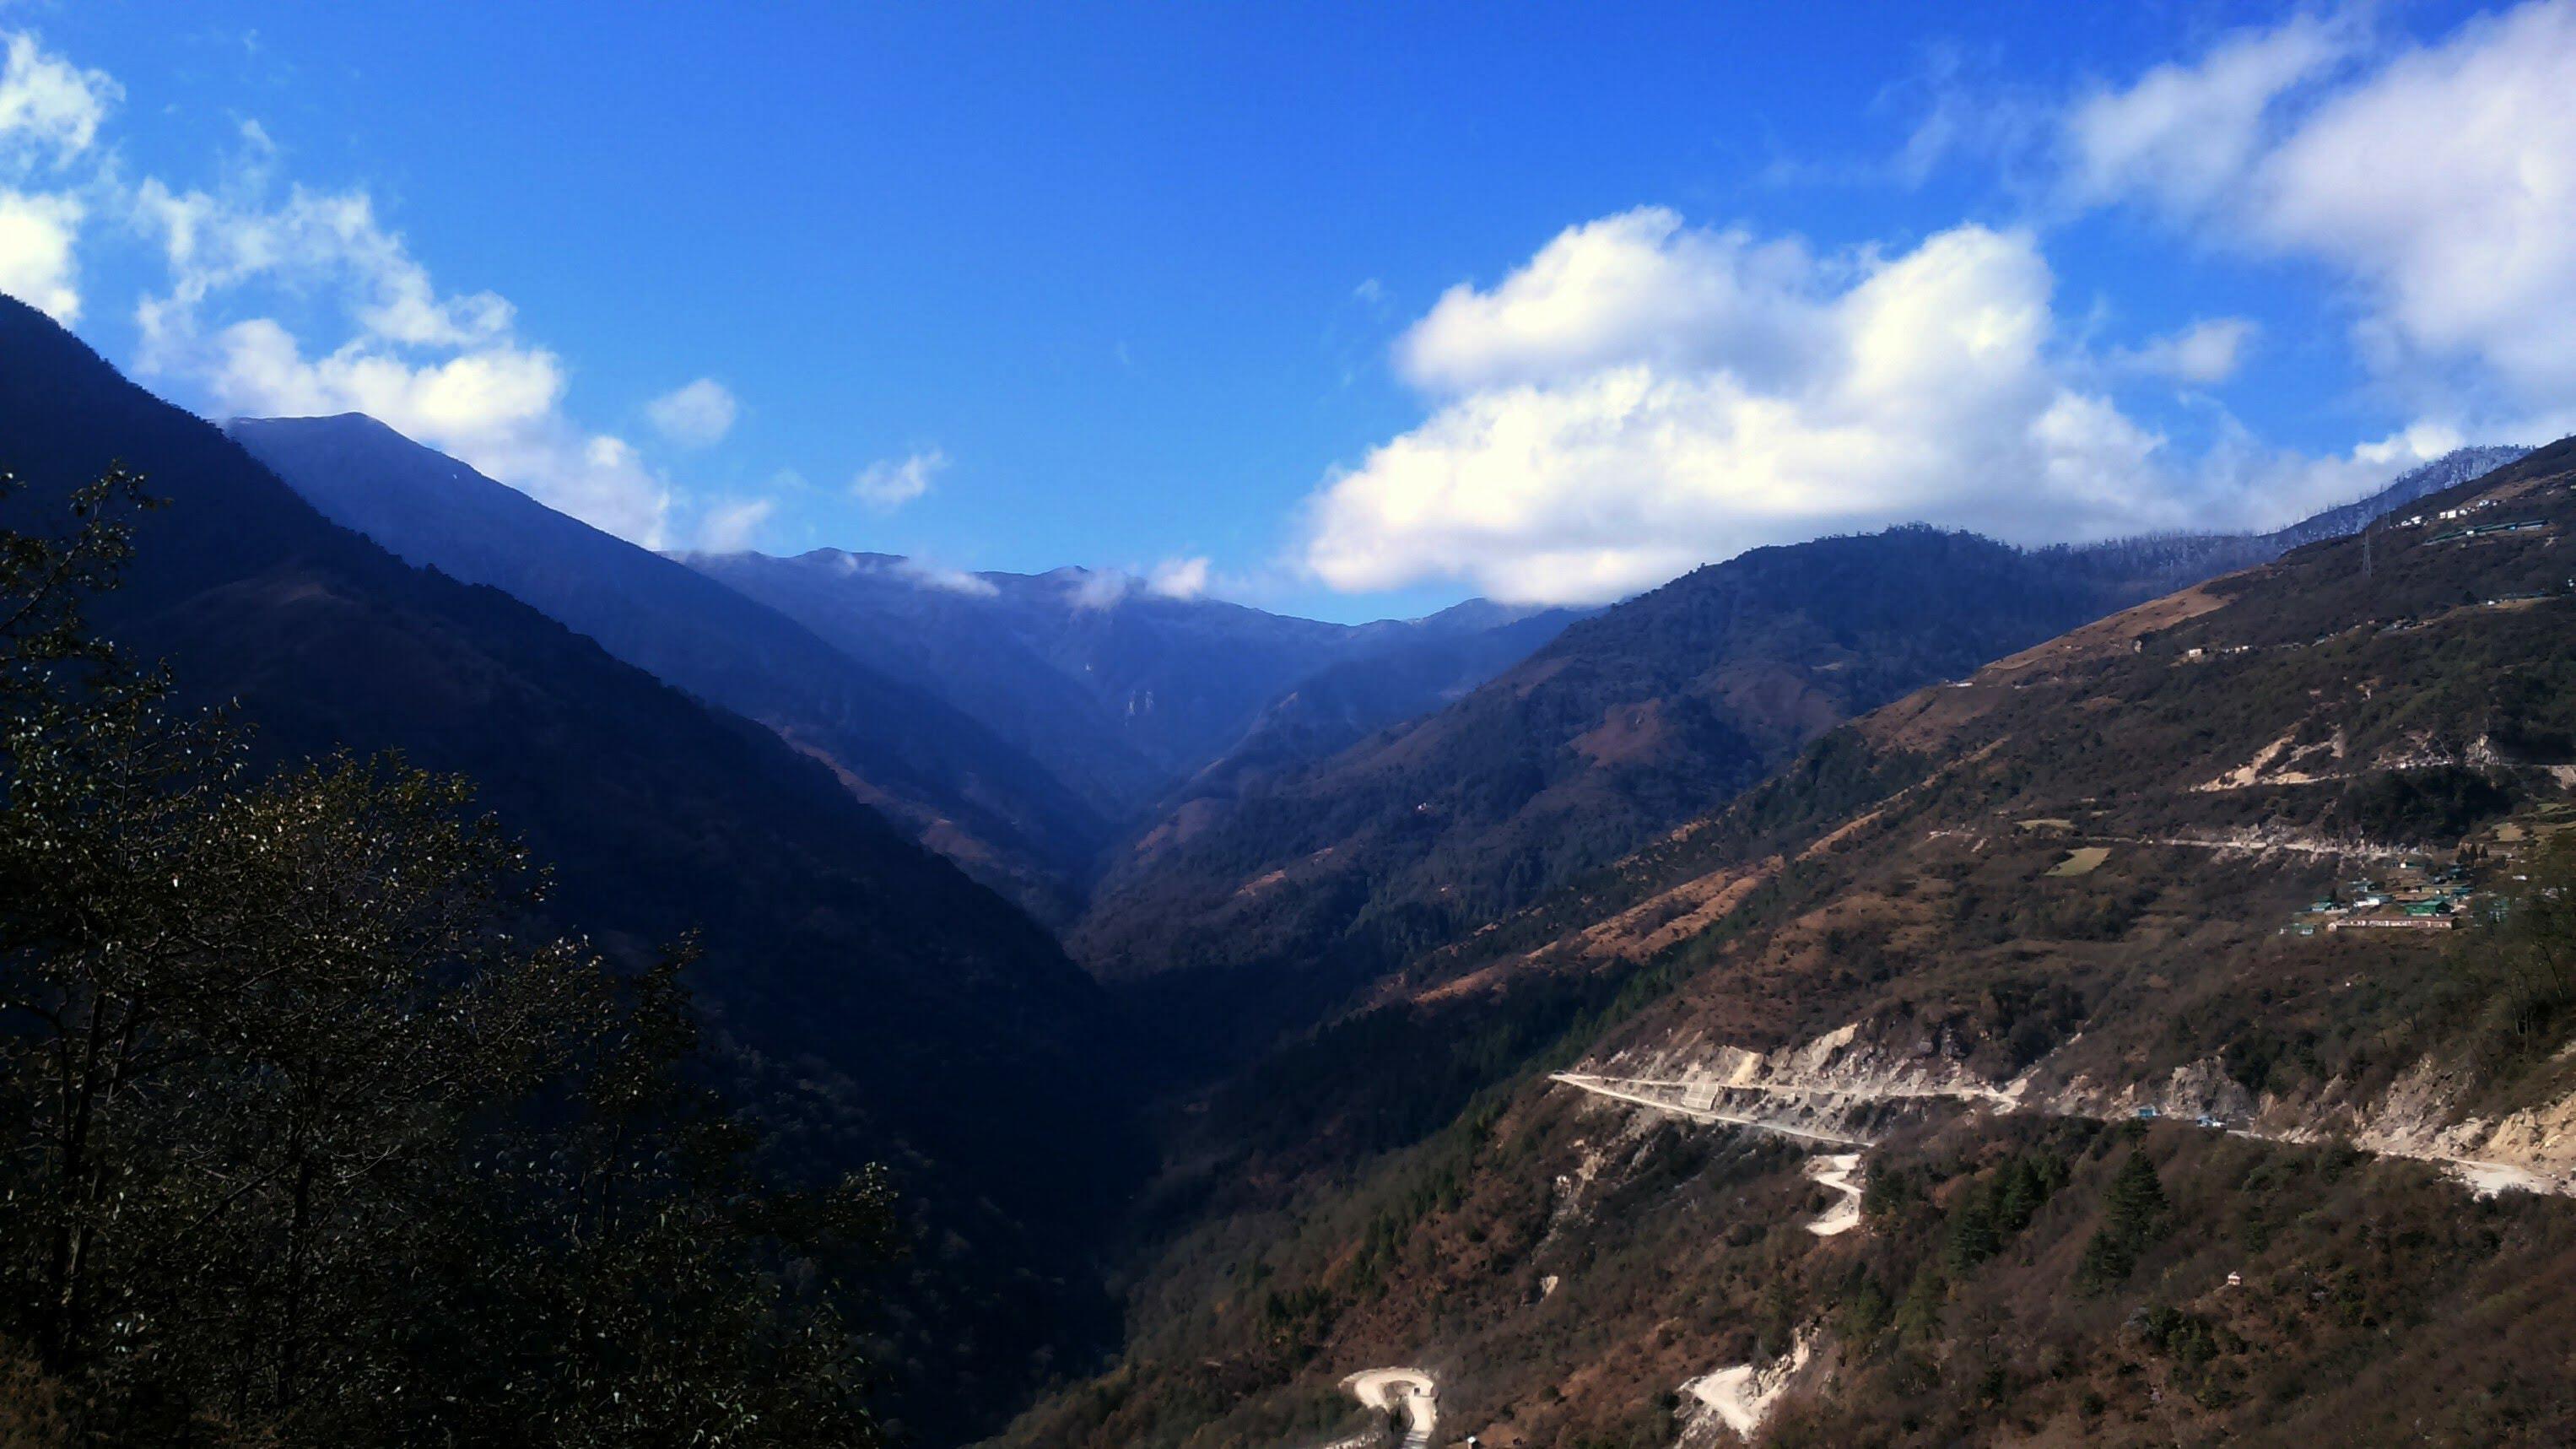 Unusual places to visit in India Arunchal Pradesh